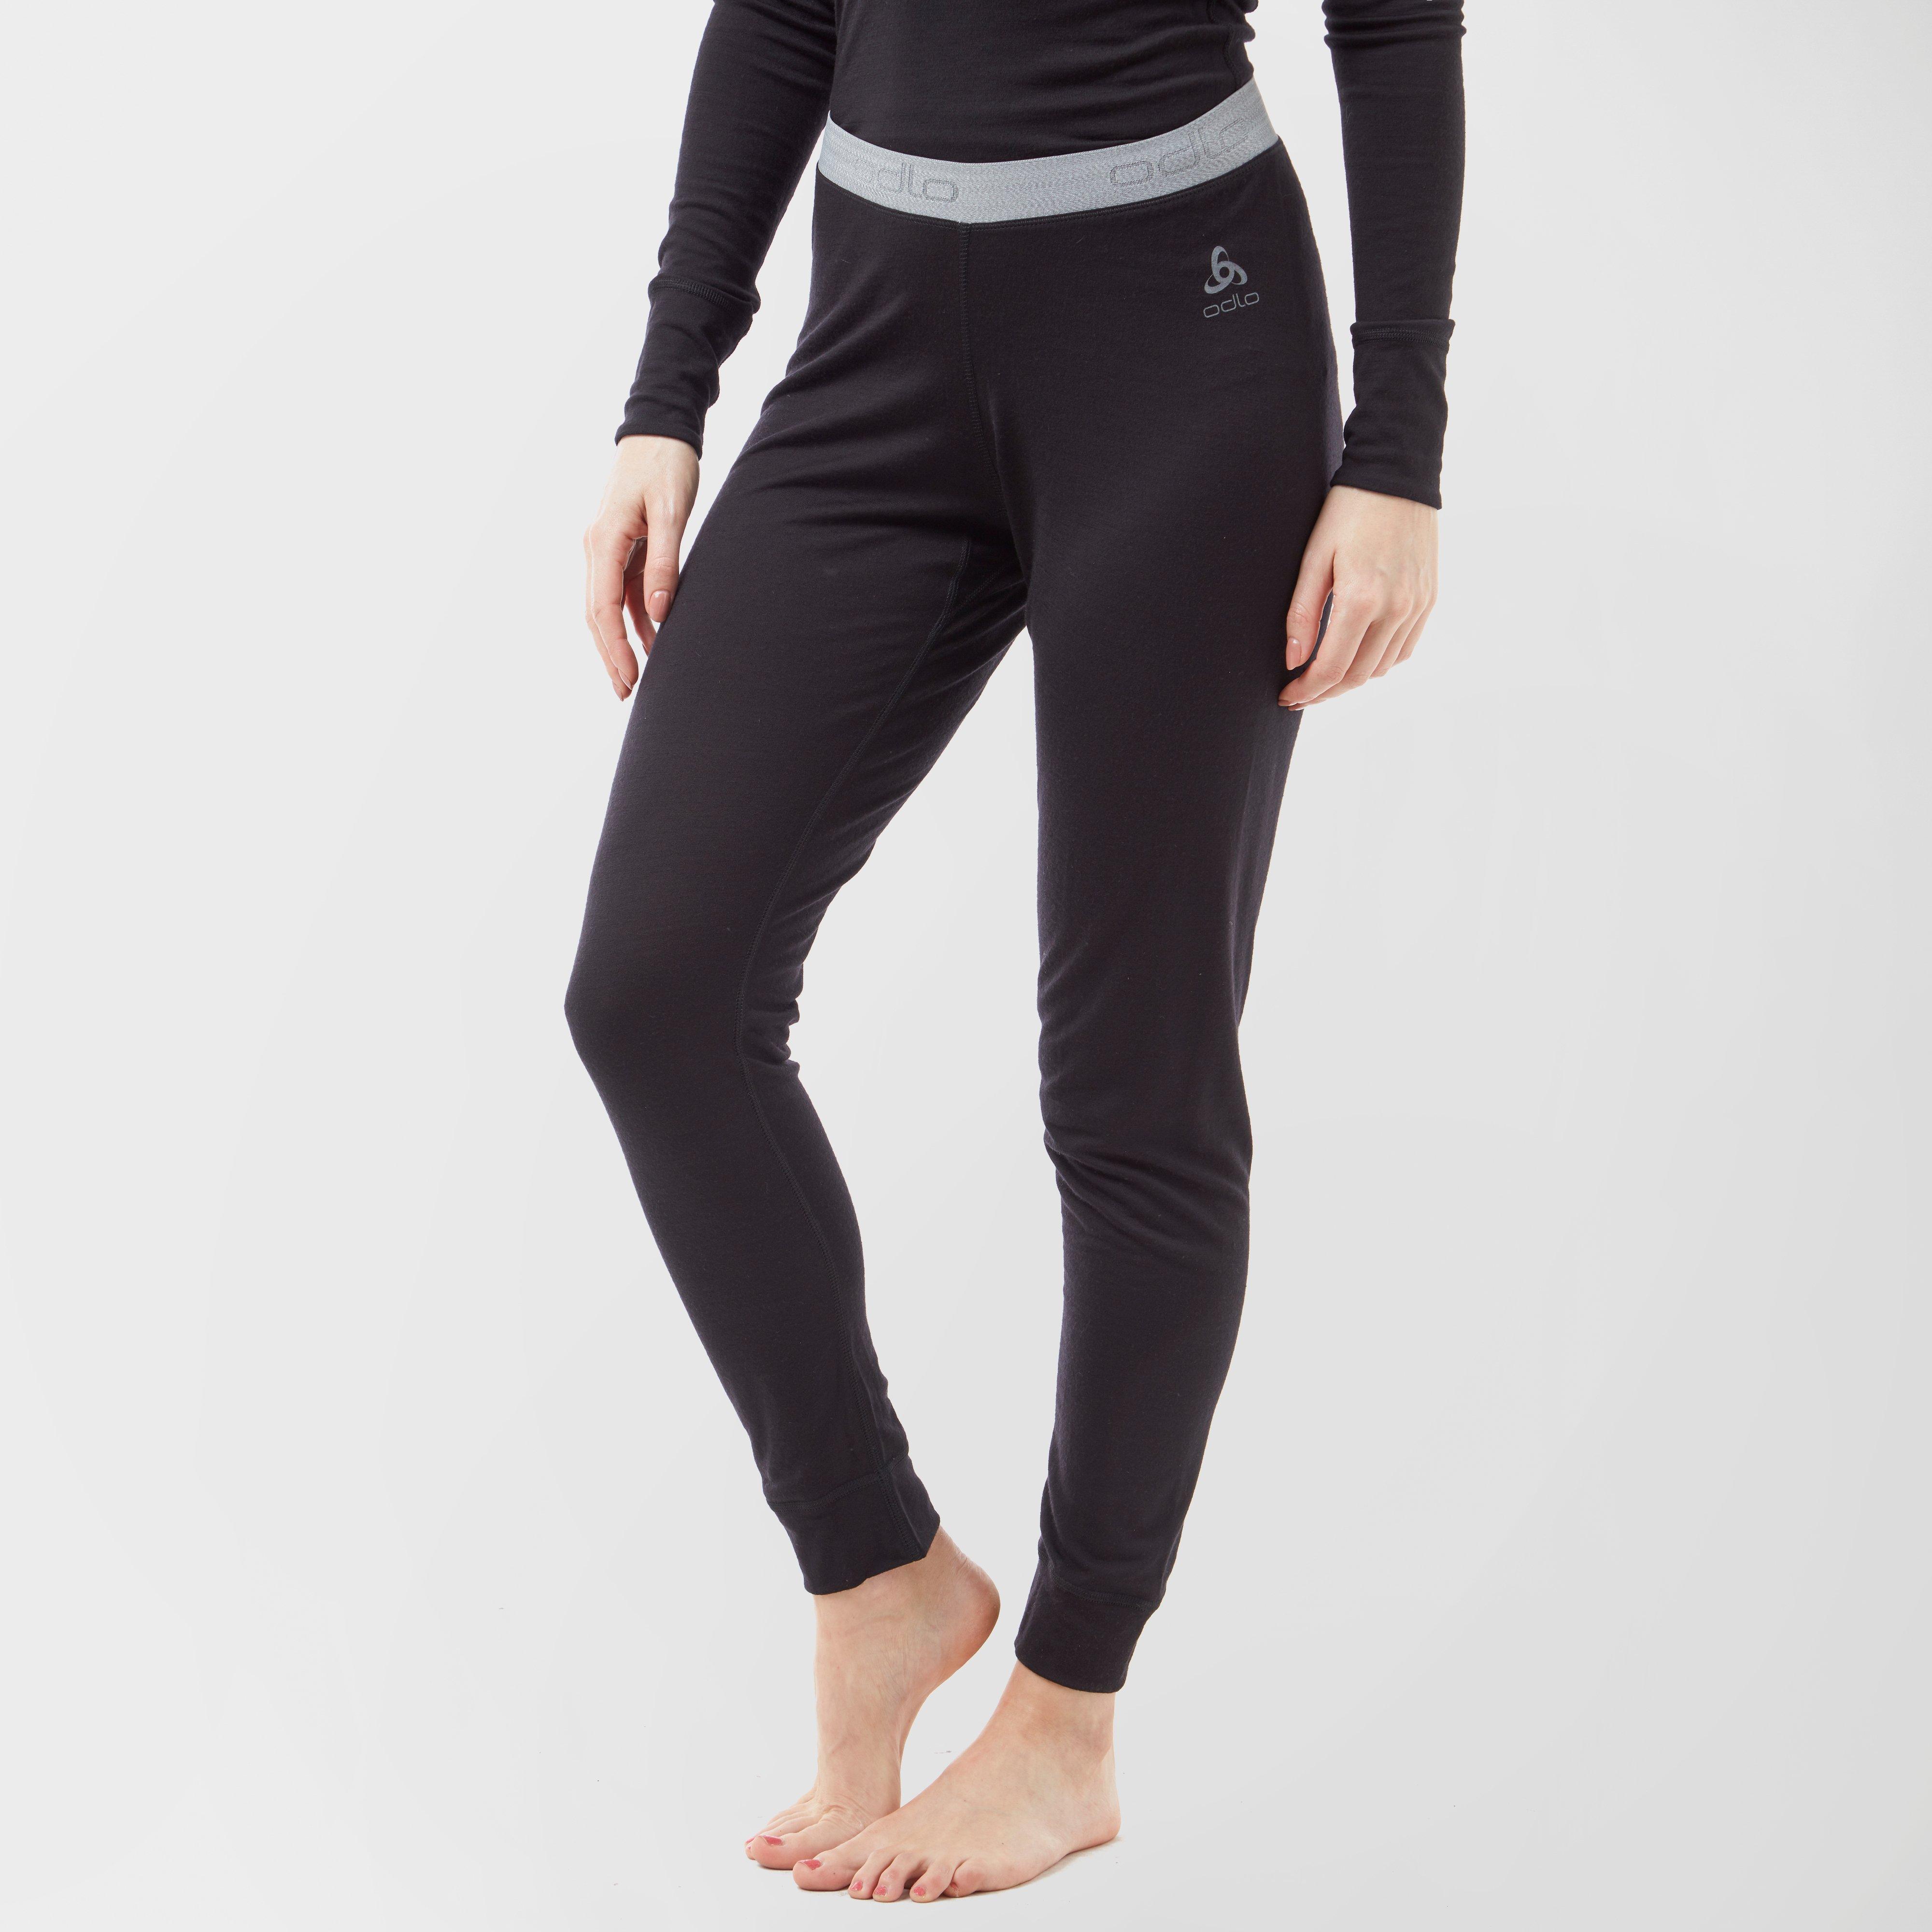 Odlo Odlo Womens Merino Warm Pants - Black, Black